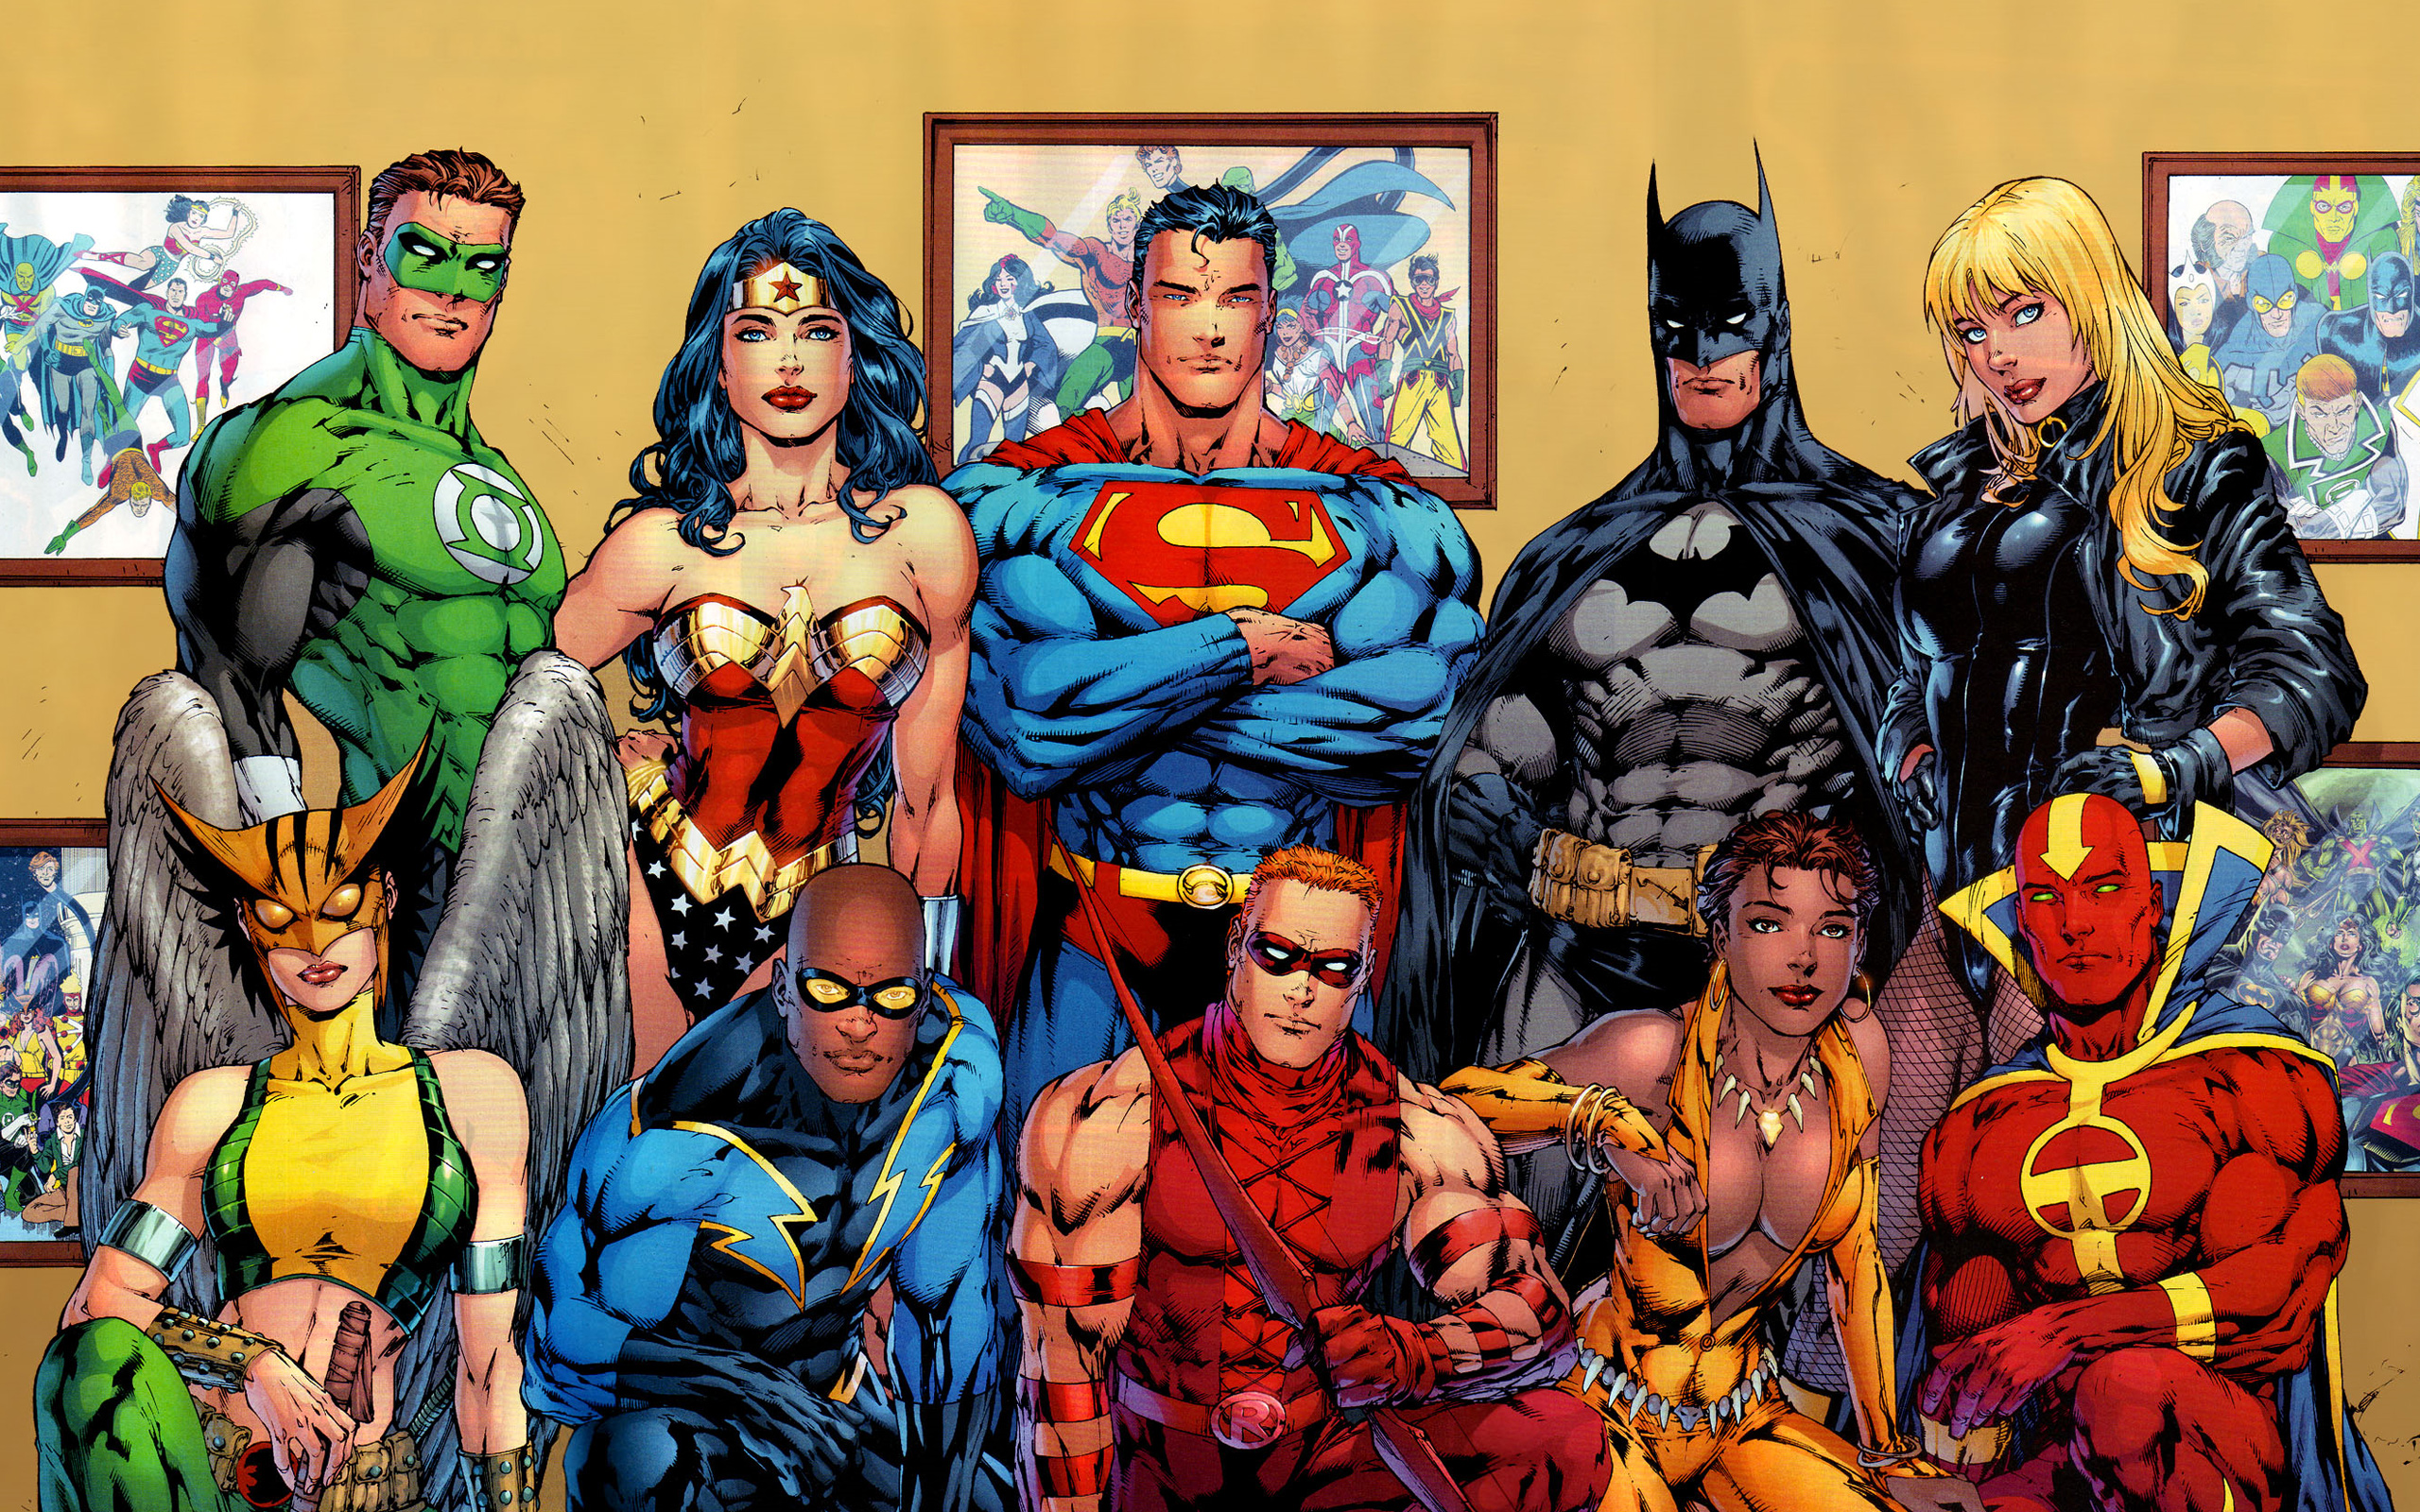 Hd wallpaper justice league - Justice League Wallpaper Wallpaper Wide Hd